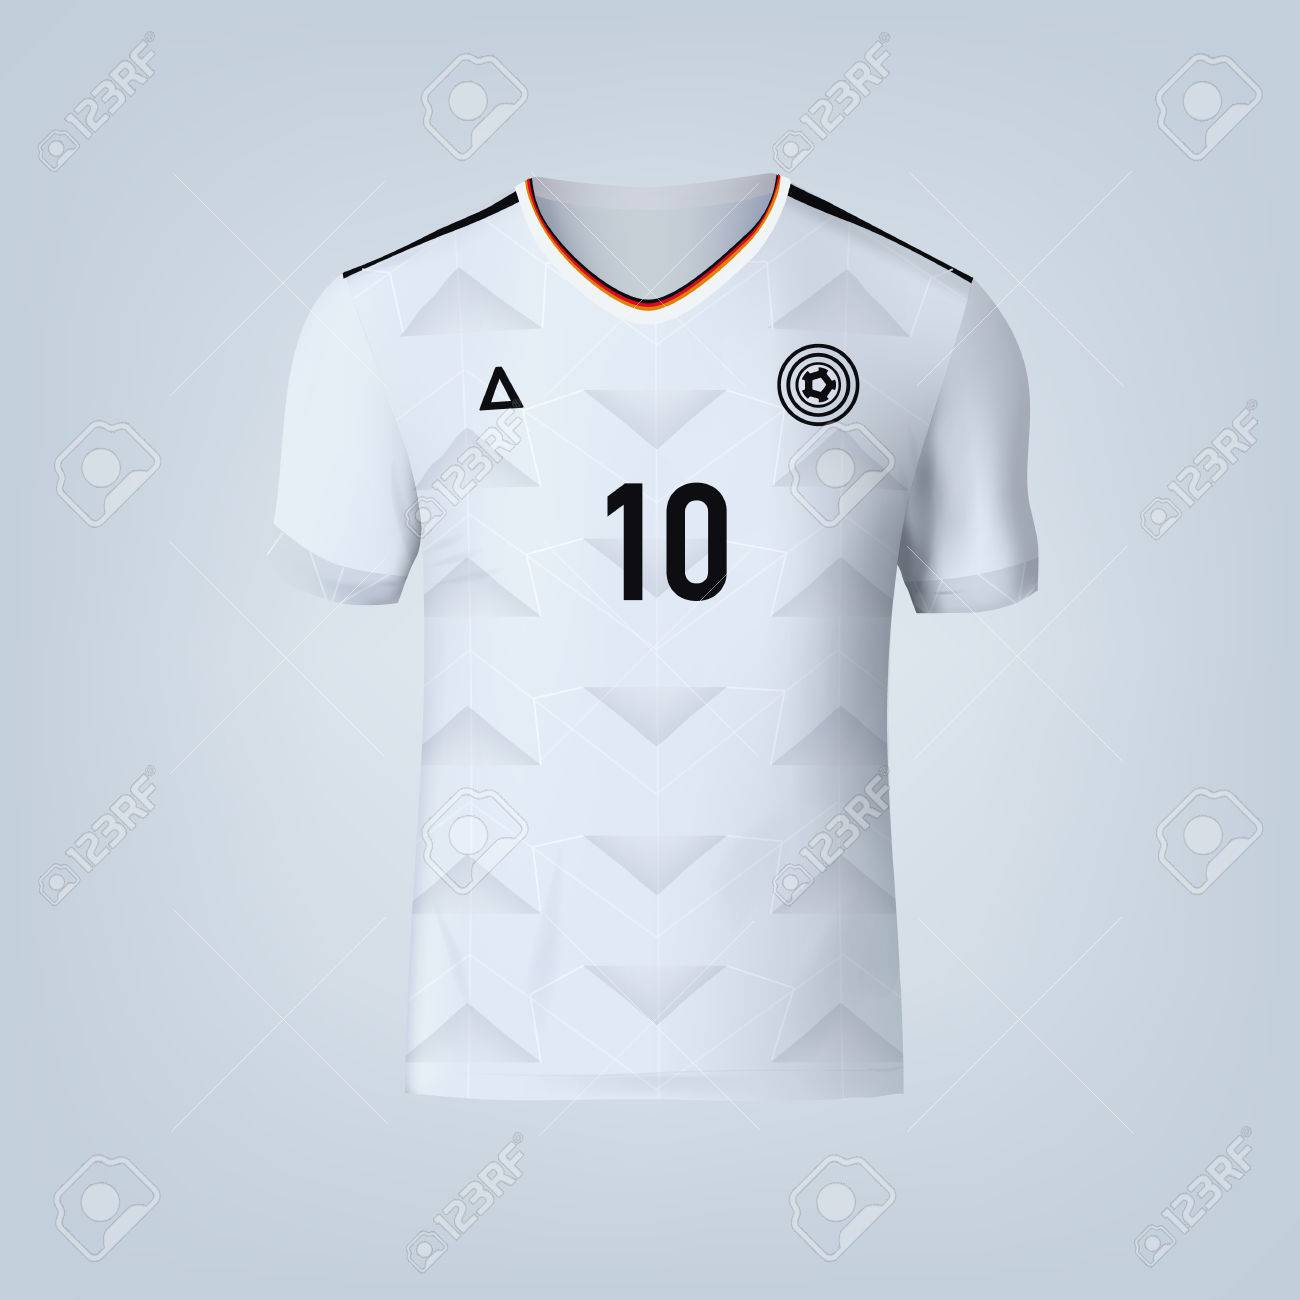 Vector illustration of football t-shirt template. - 84012295